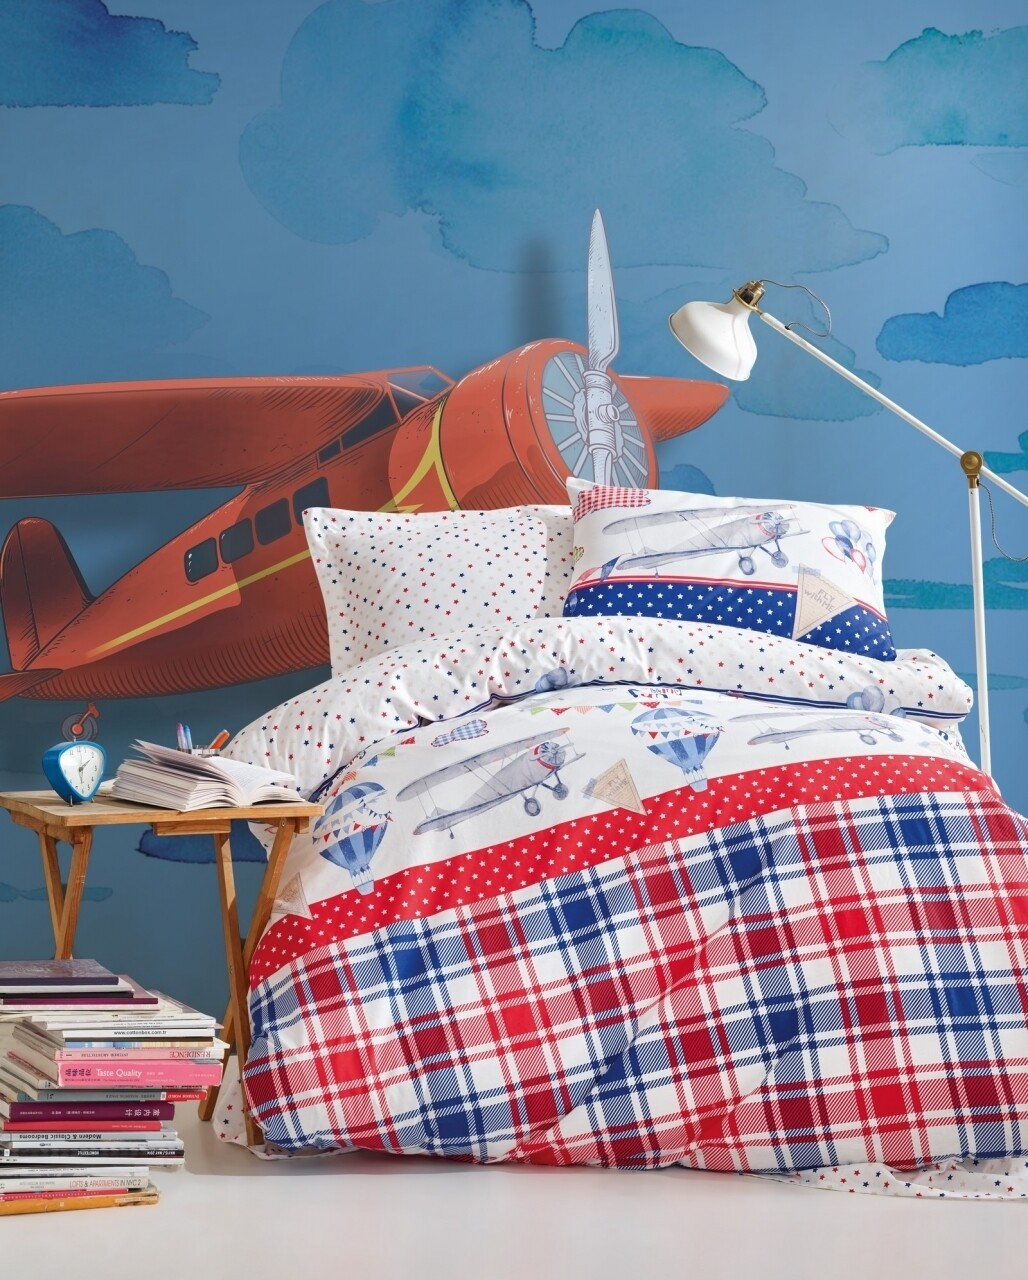 Lenjerie de pat pentru o persoana Airballon, Cotton Box, 3 piese, 160 x 240 cm, 100% bumbac ranforce, multicolora